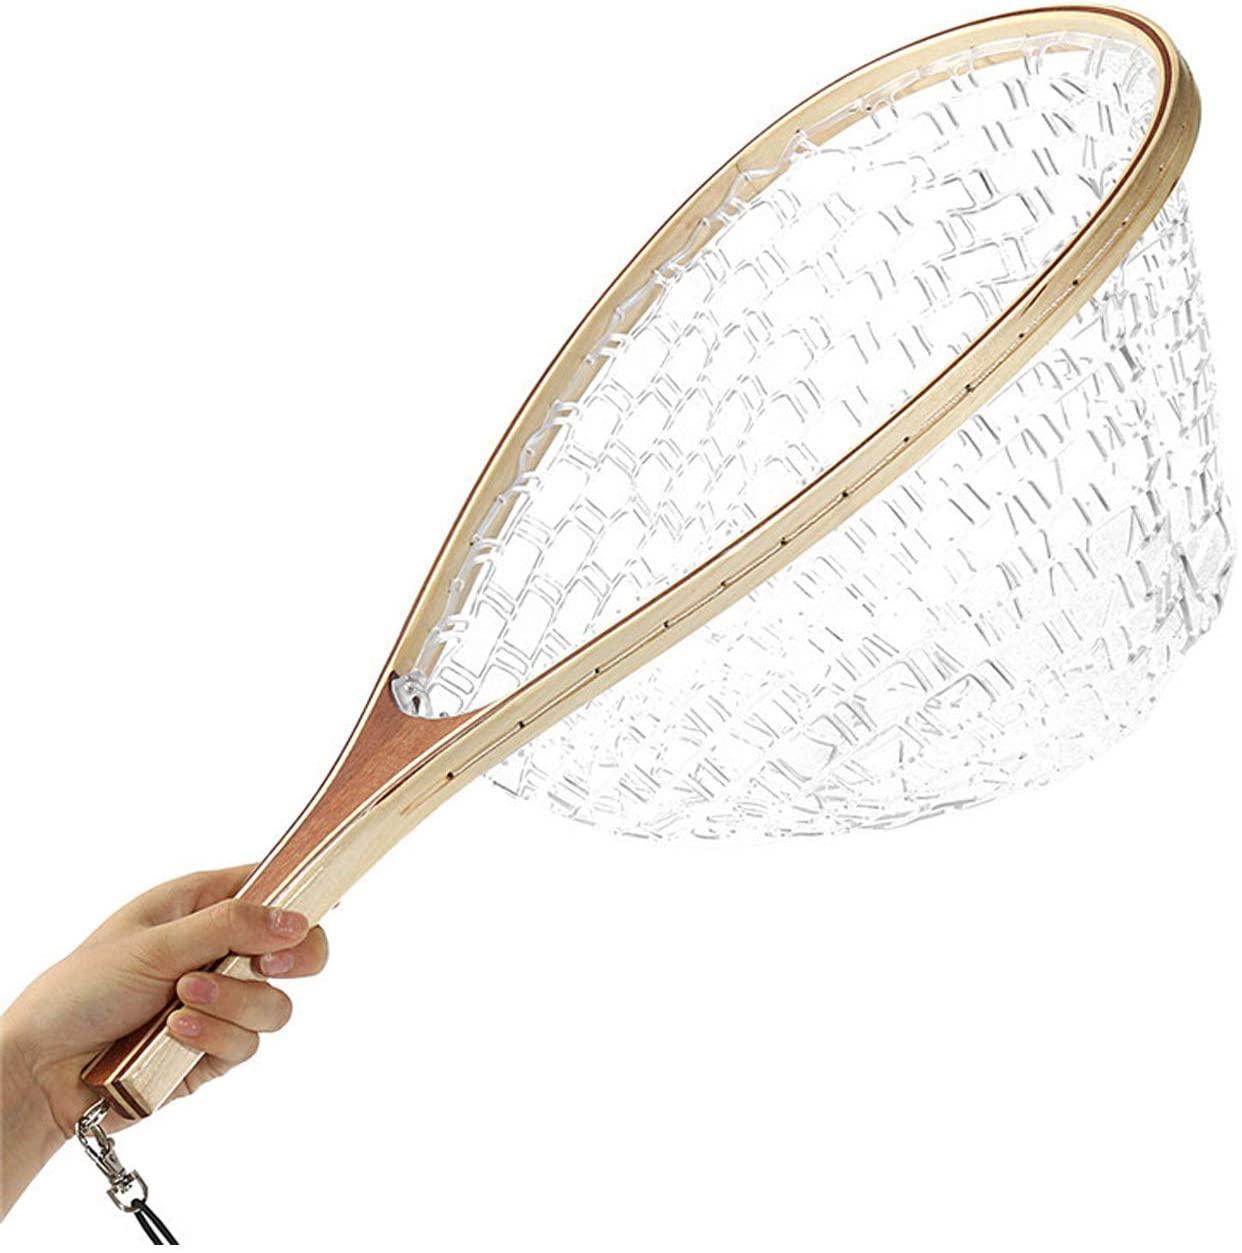 FREGITO Fly Landing Nets for Fishing, Rubber Net Pocket, Anti-wrap line, Anti-Hook, Protect Fish